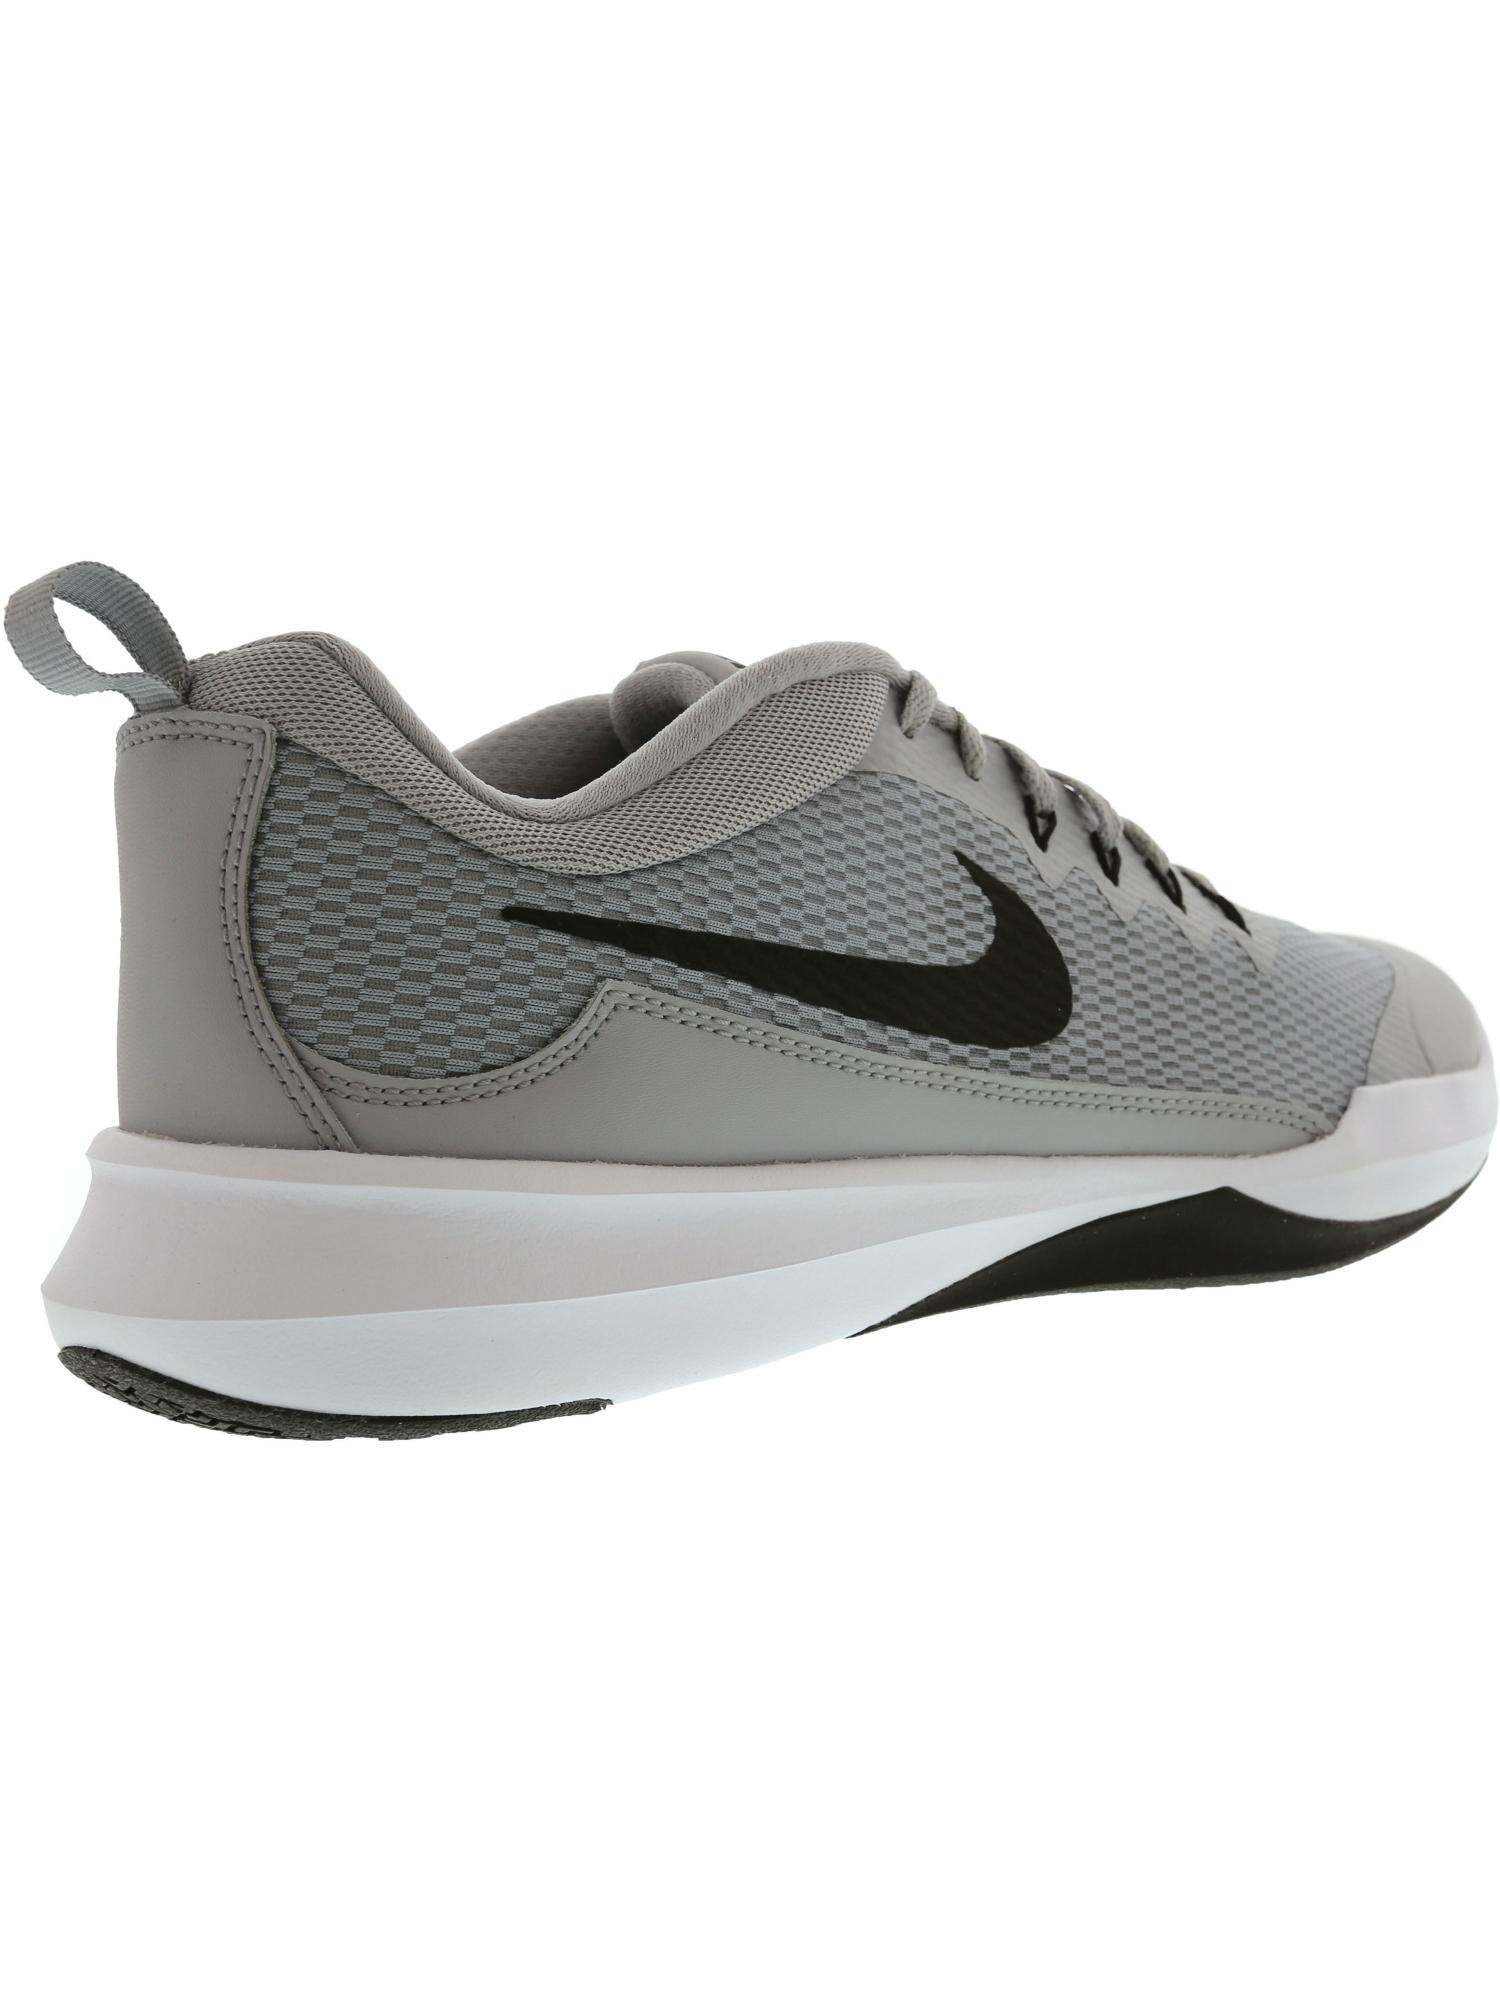 a7146253228ba Nike Men s Legend Trainer Ankle-High Training Shoes